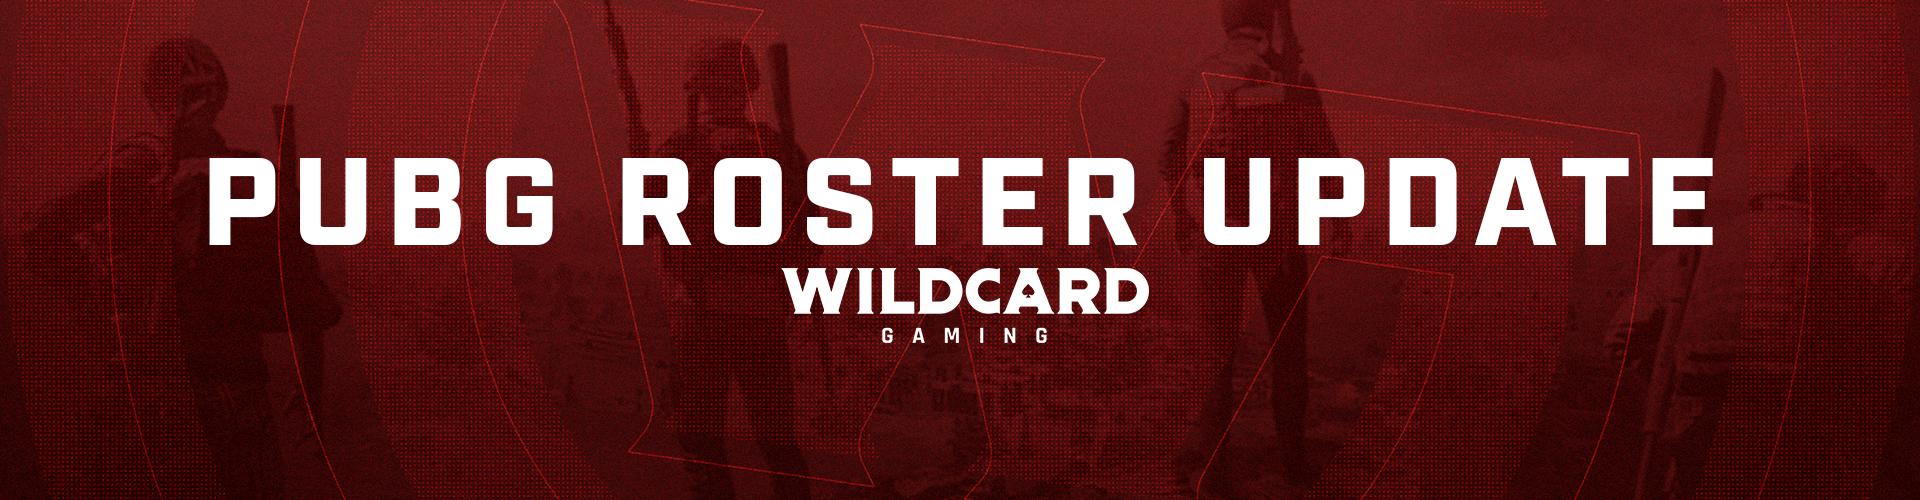 Wildcard PUBG Roster Update